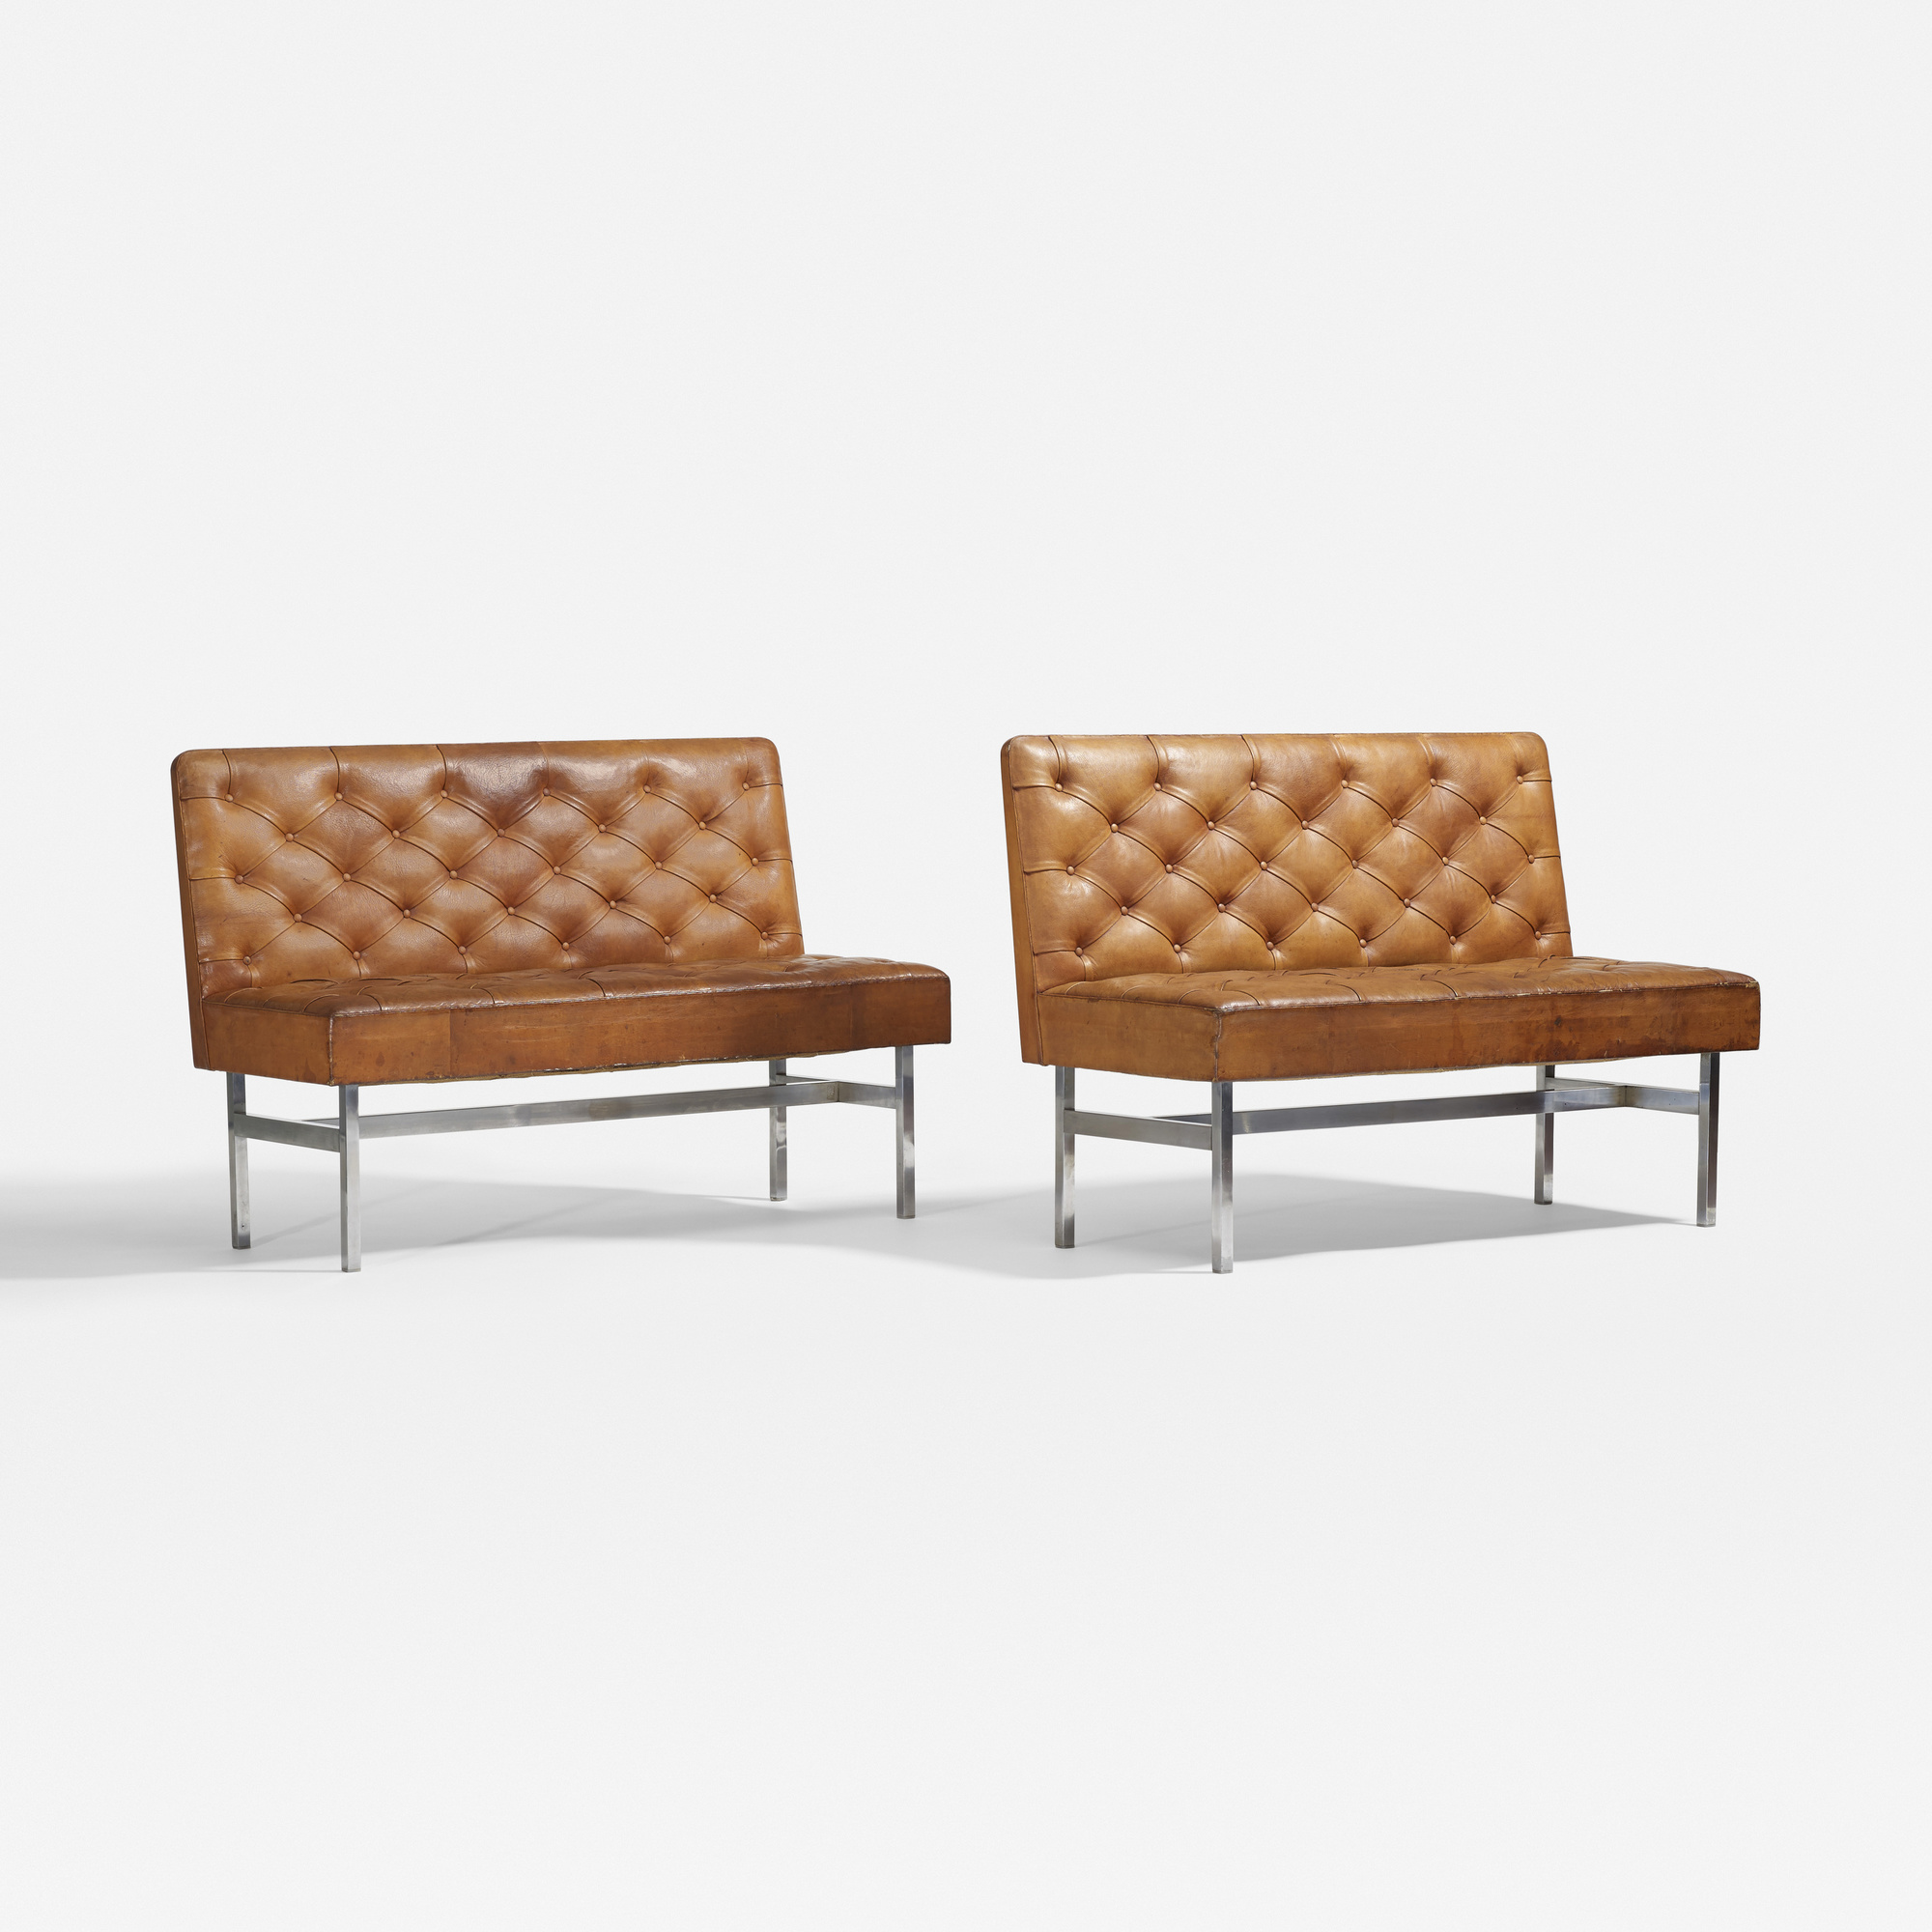 125: Kaare Klint / custom benches, pair (1 of 3)